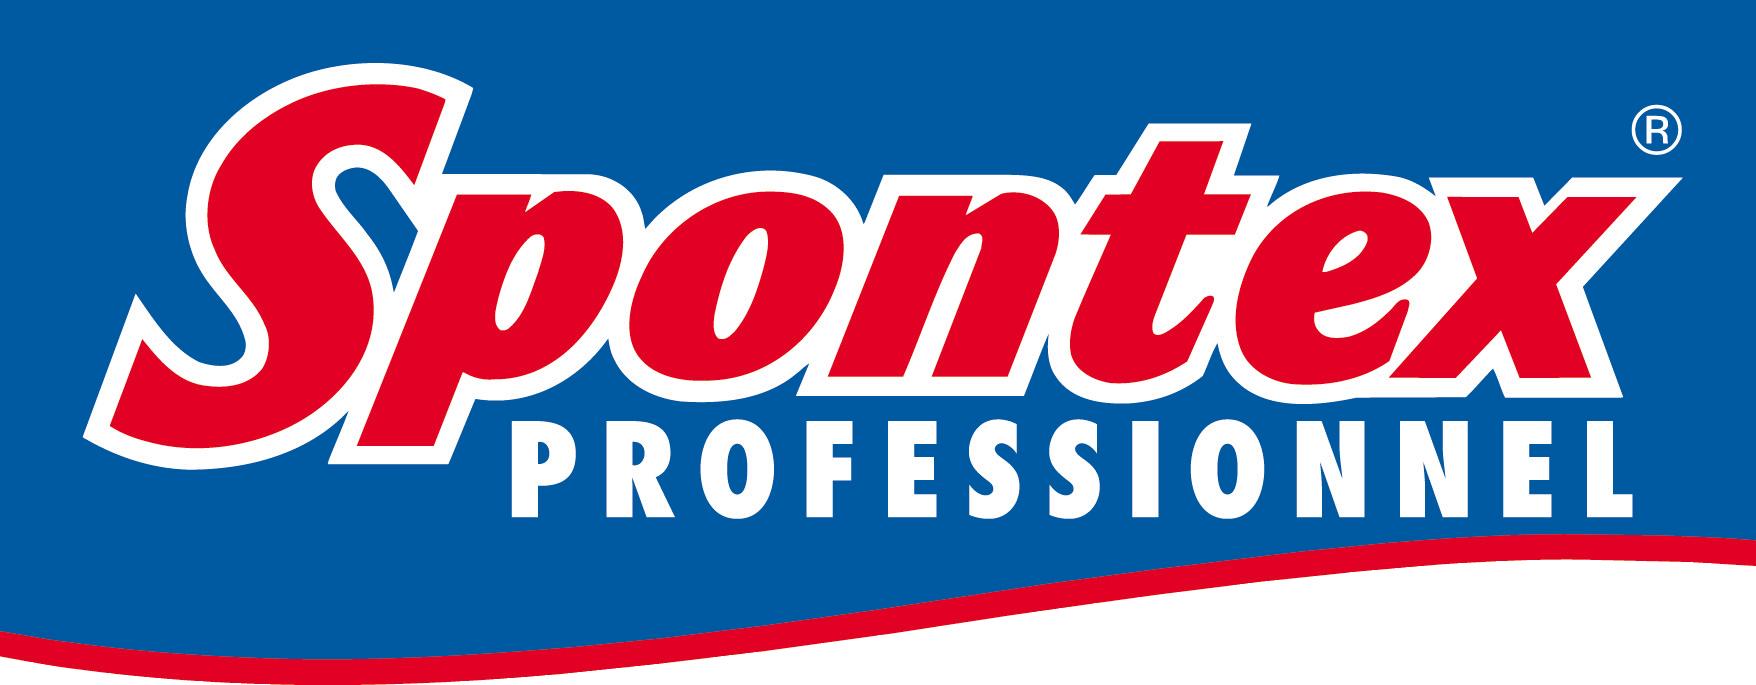 SPONTEX